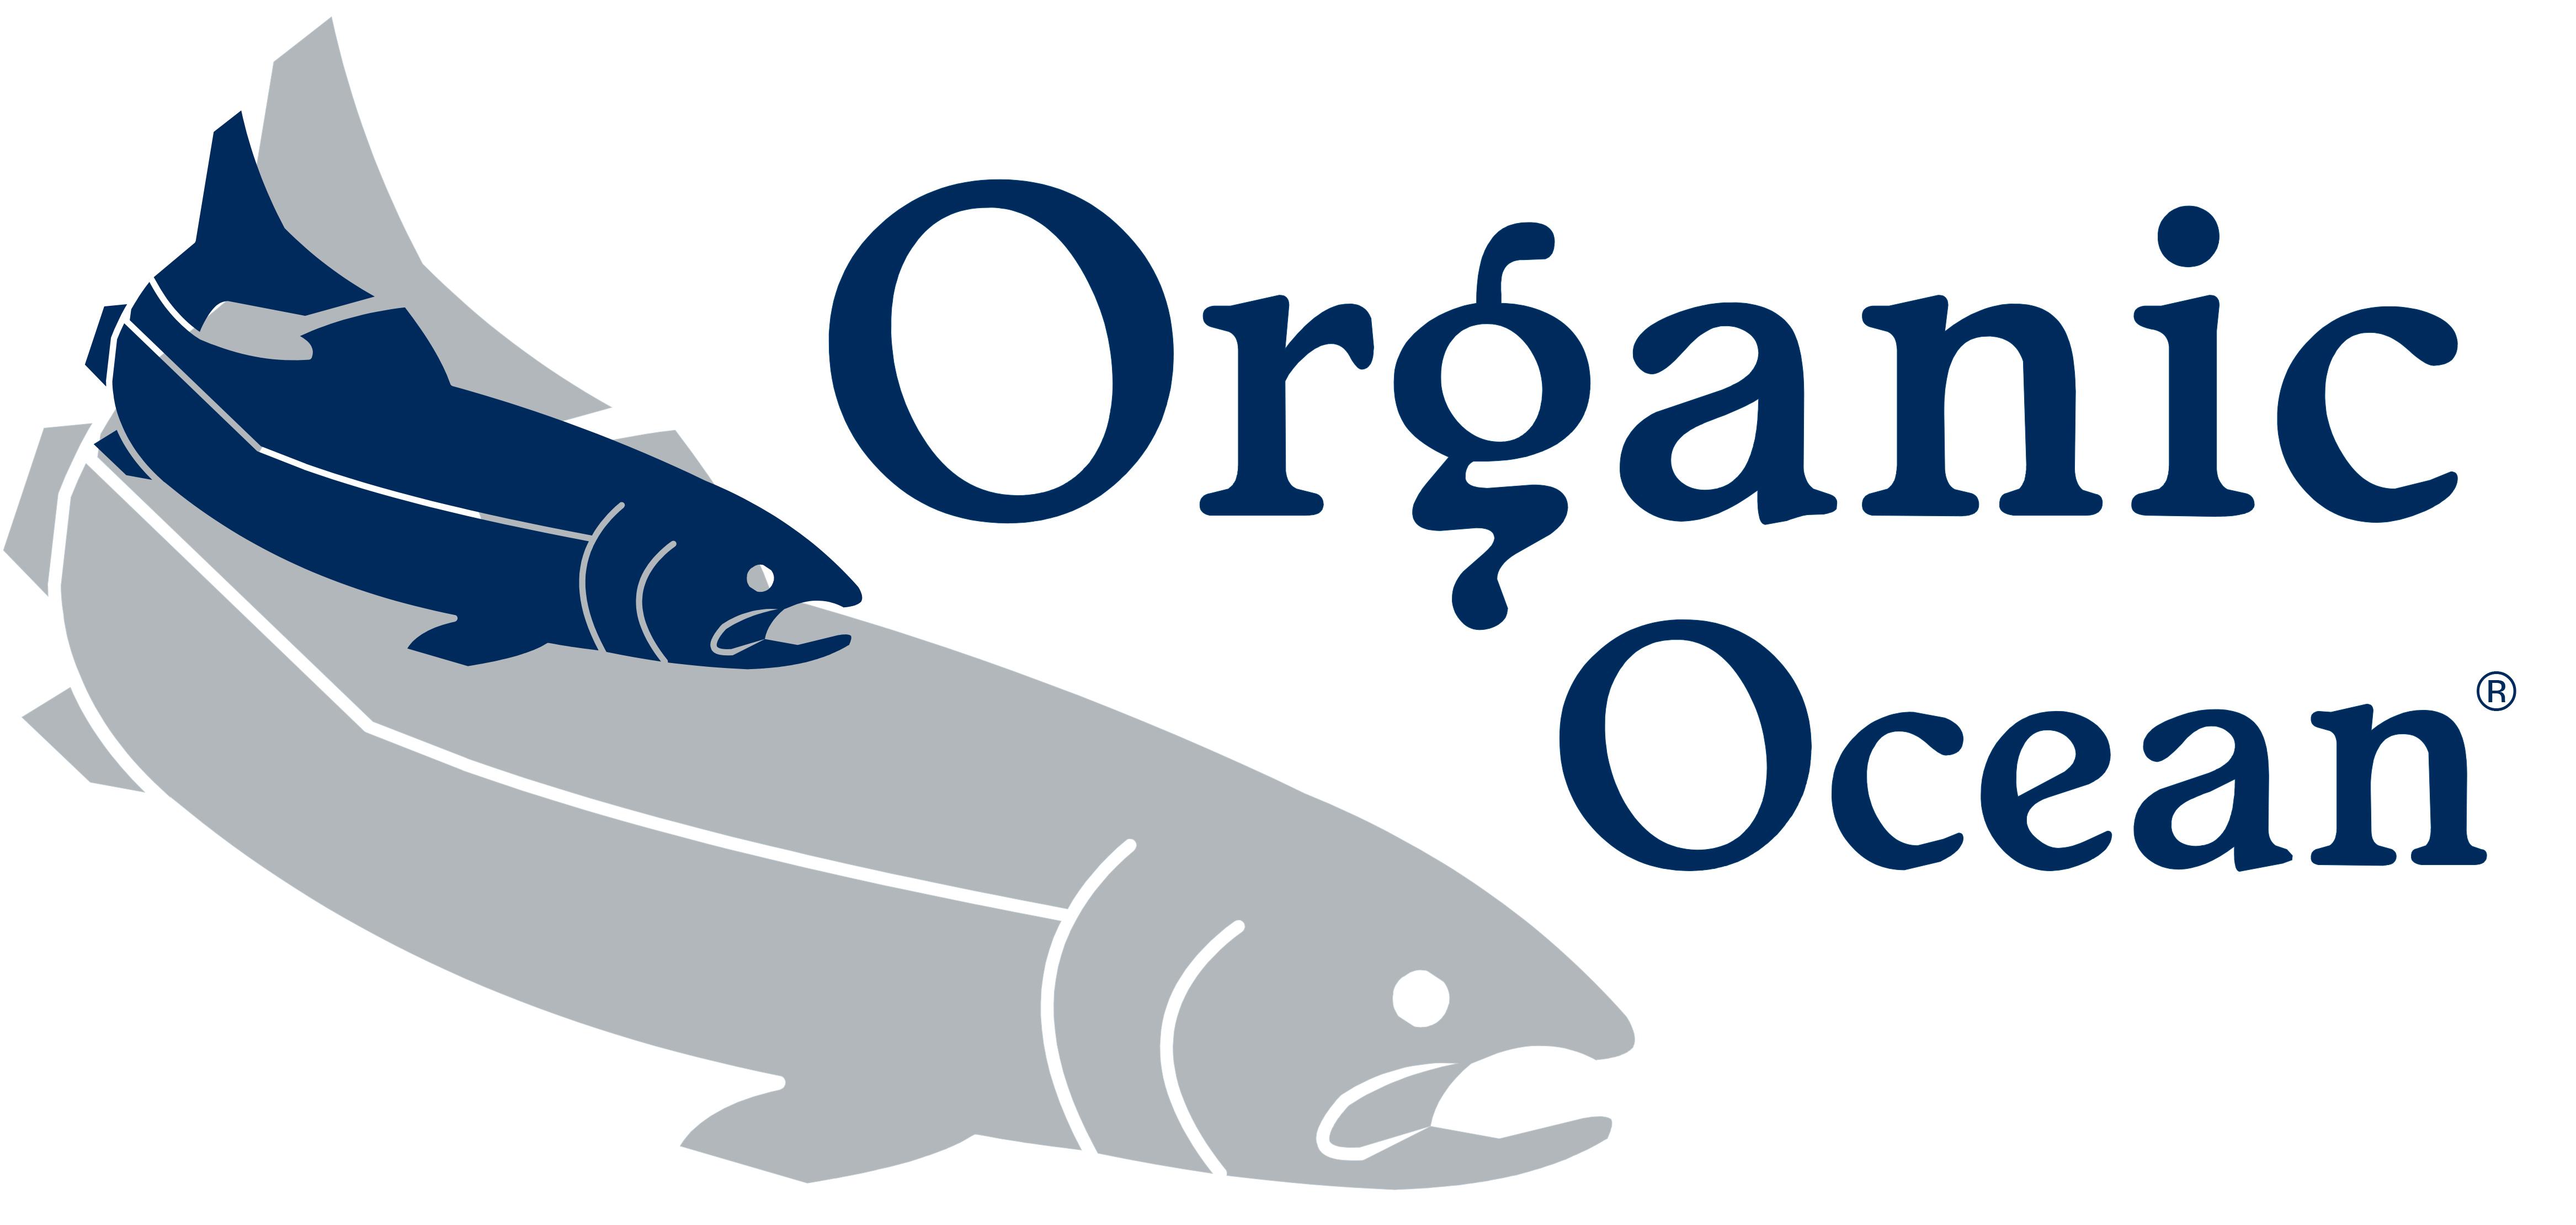 Organic Ocean Seafood Inc. logo